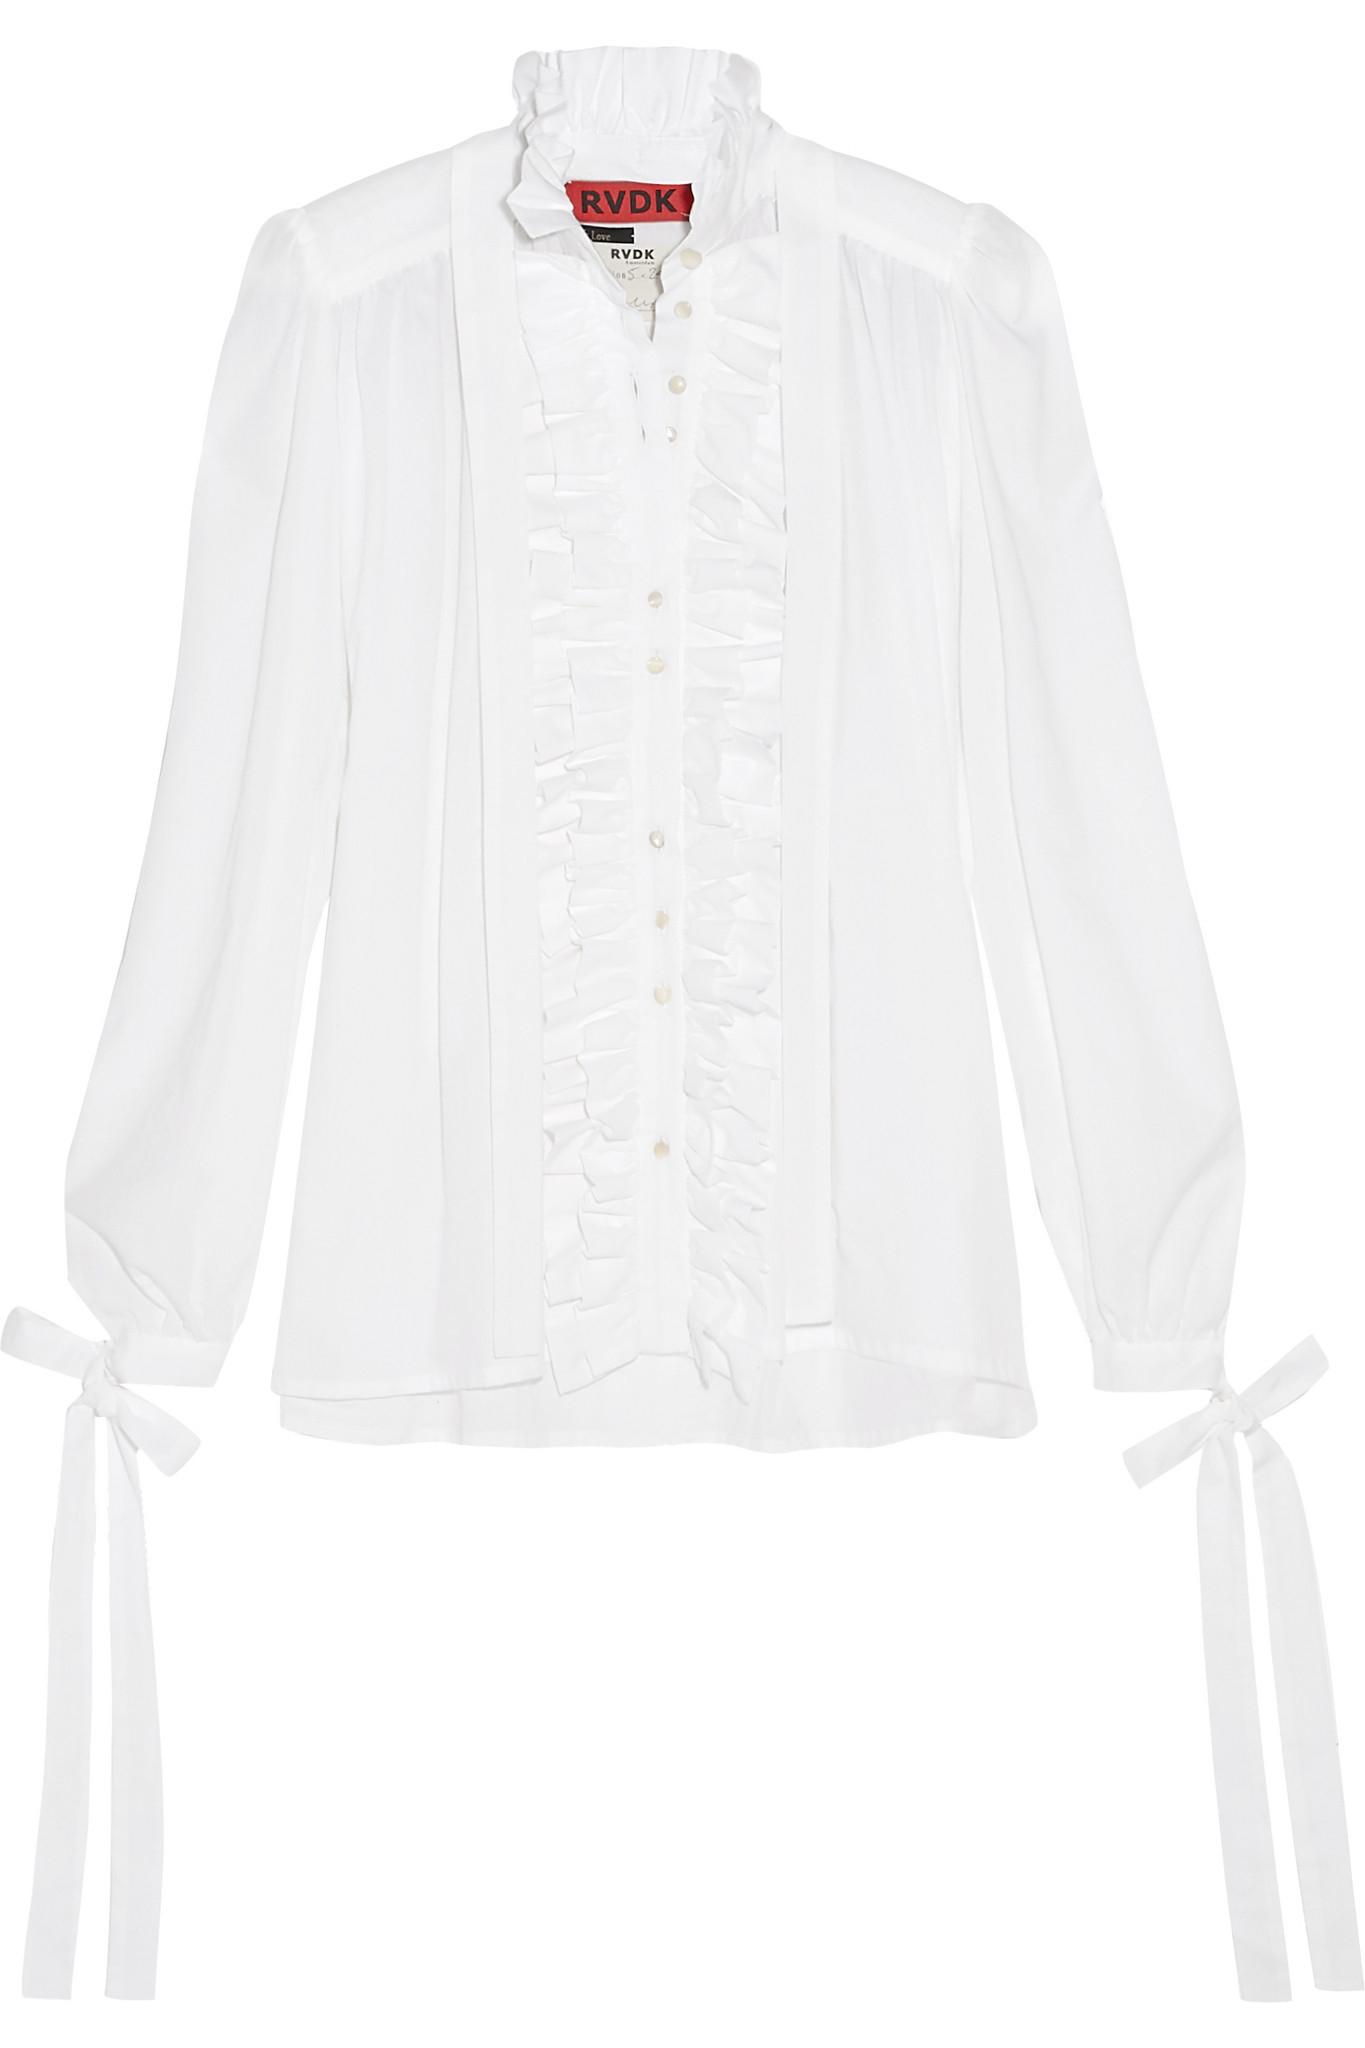 Ronald Van Der Kemp Woman Layered Cotton Shirt White Size 40 Ronald van der Kemp Outlet Perfect Sale Big Sale MWSILx